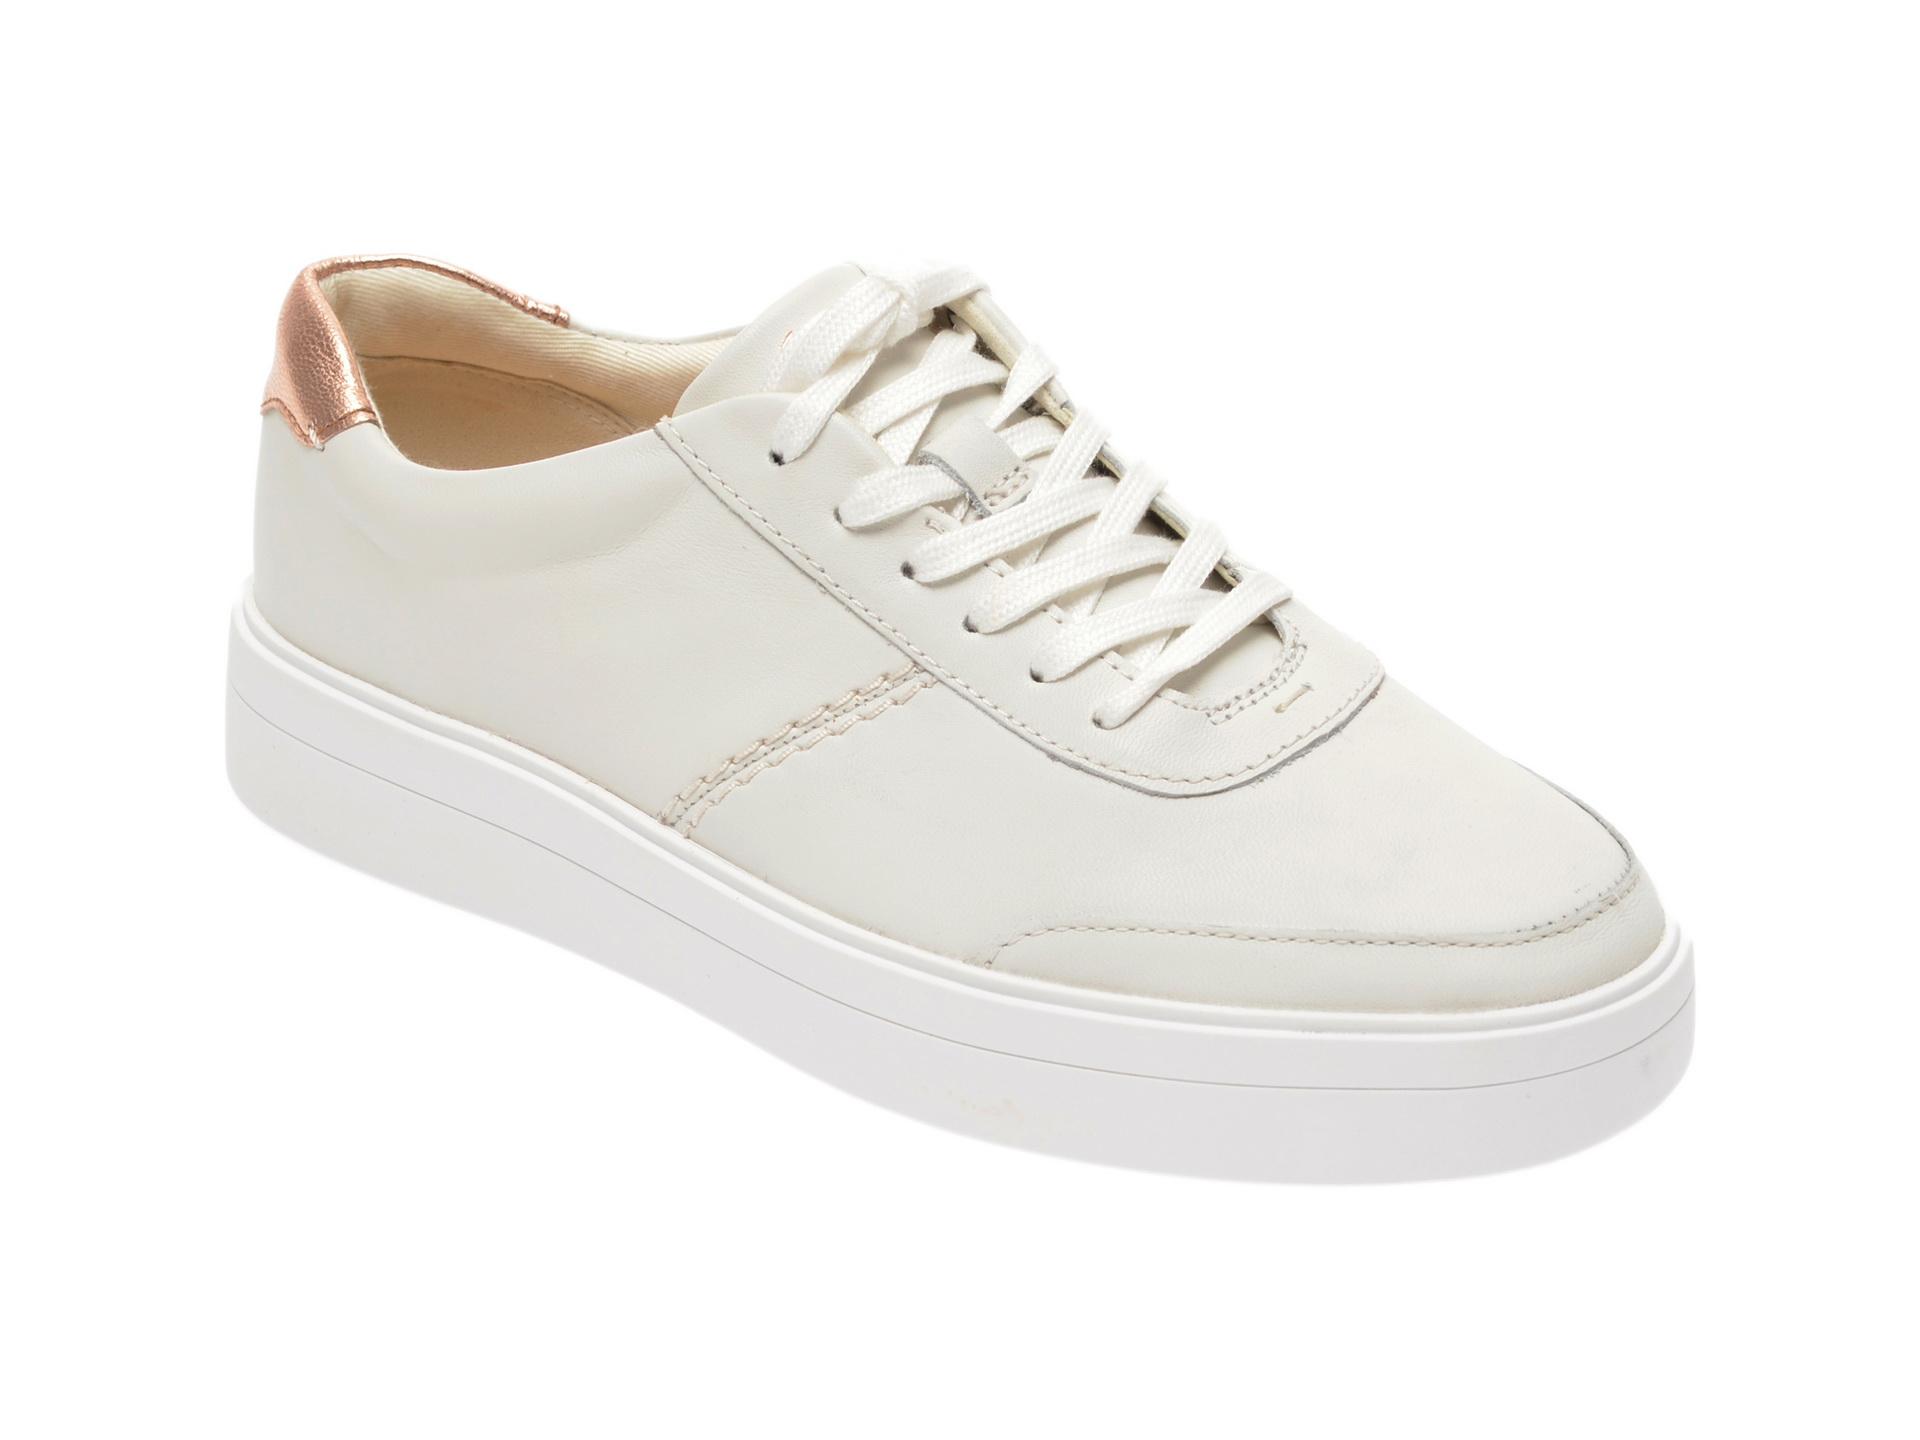 Pantofi sport CLARKS albi, Hero Walk., din piele naturala